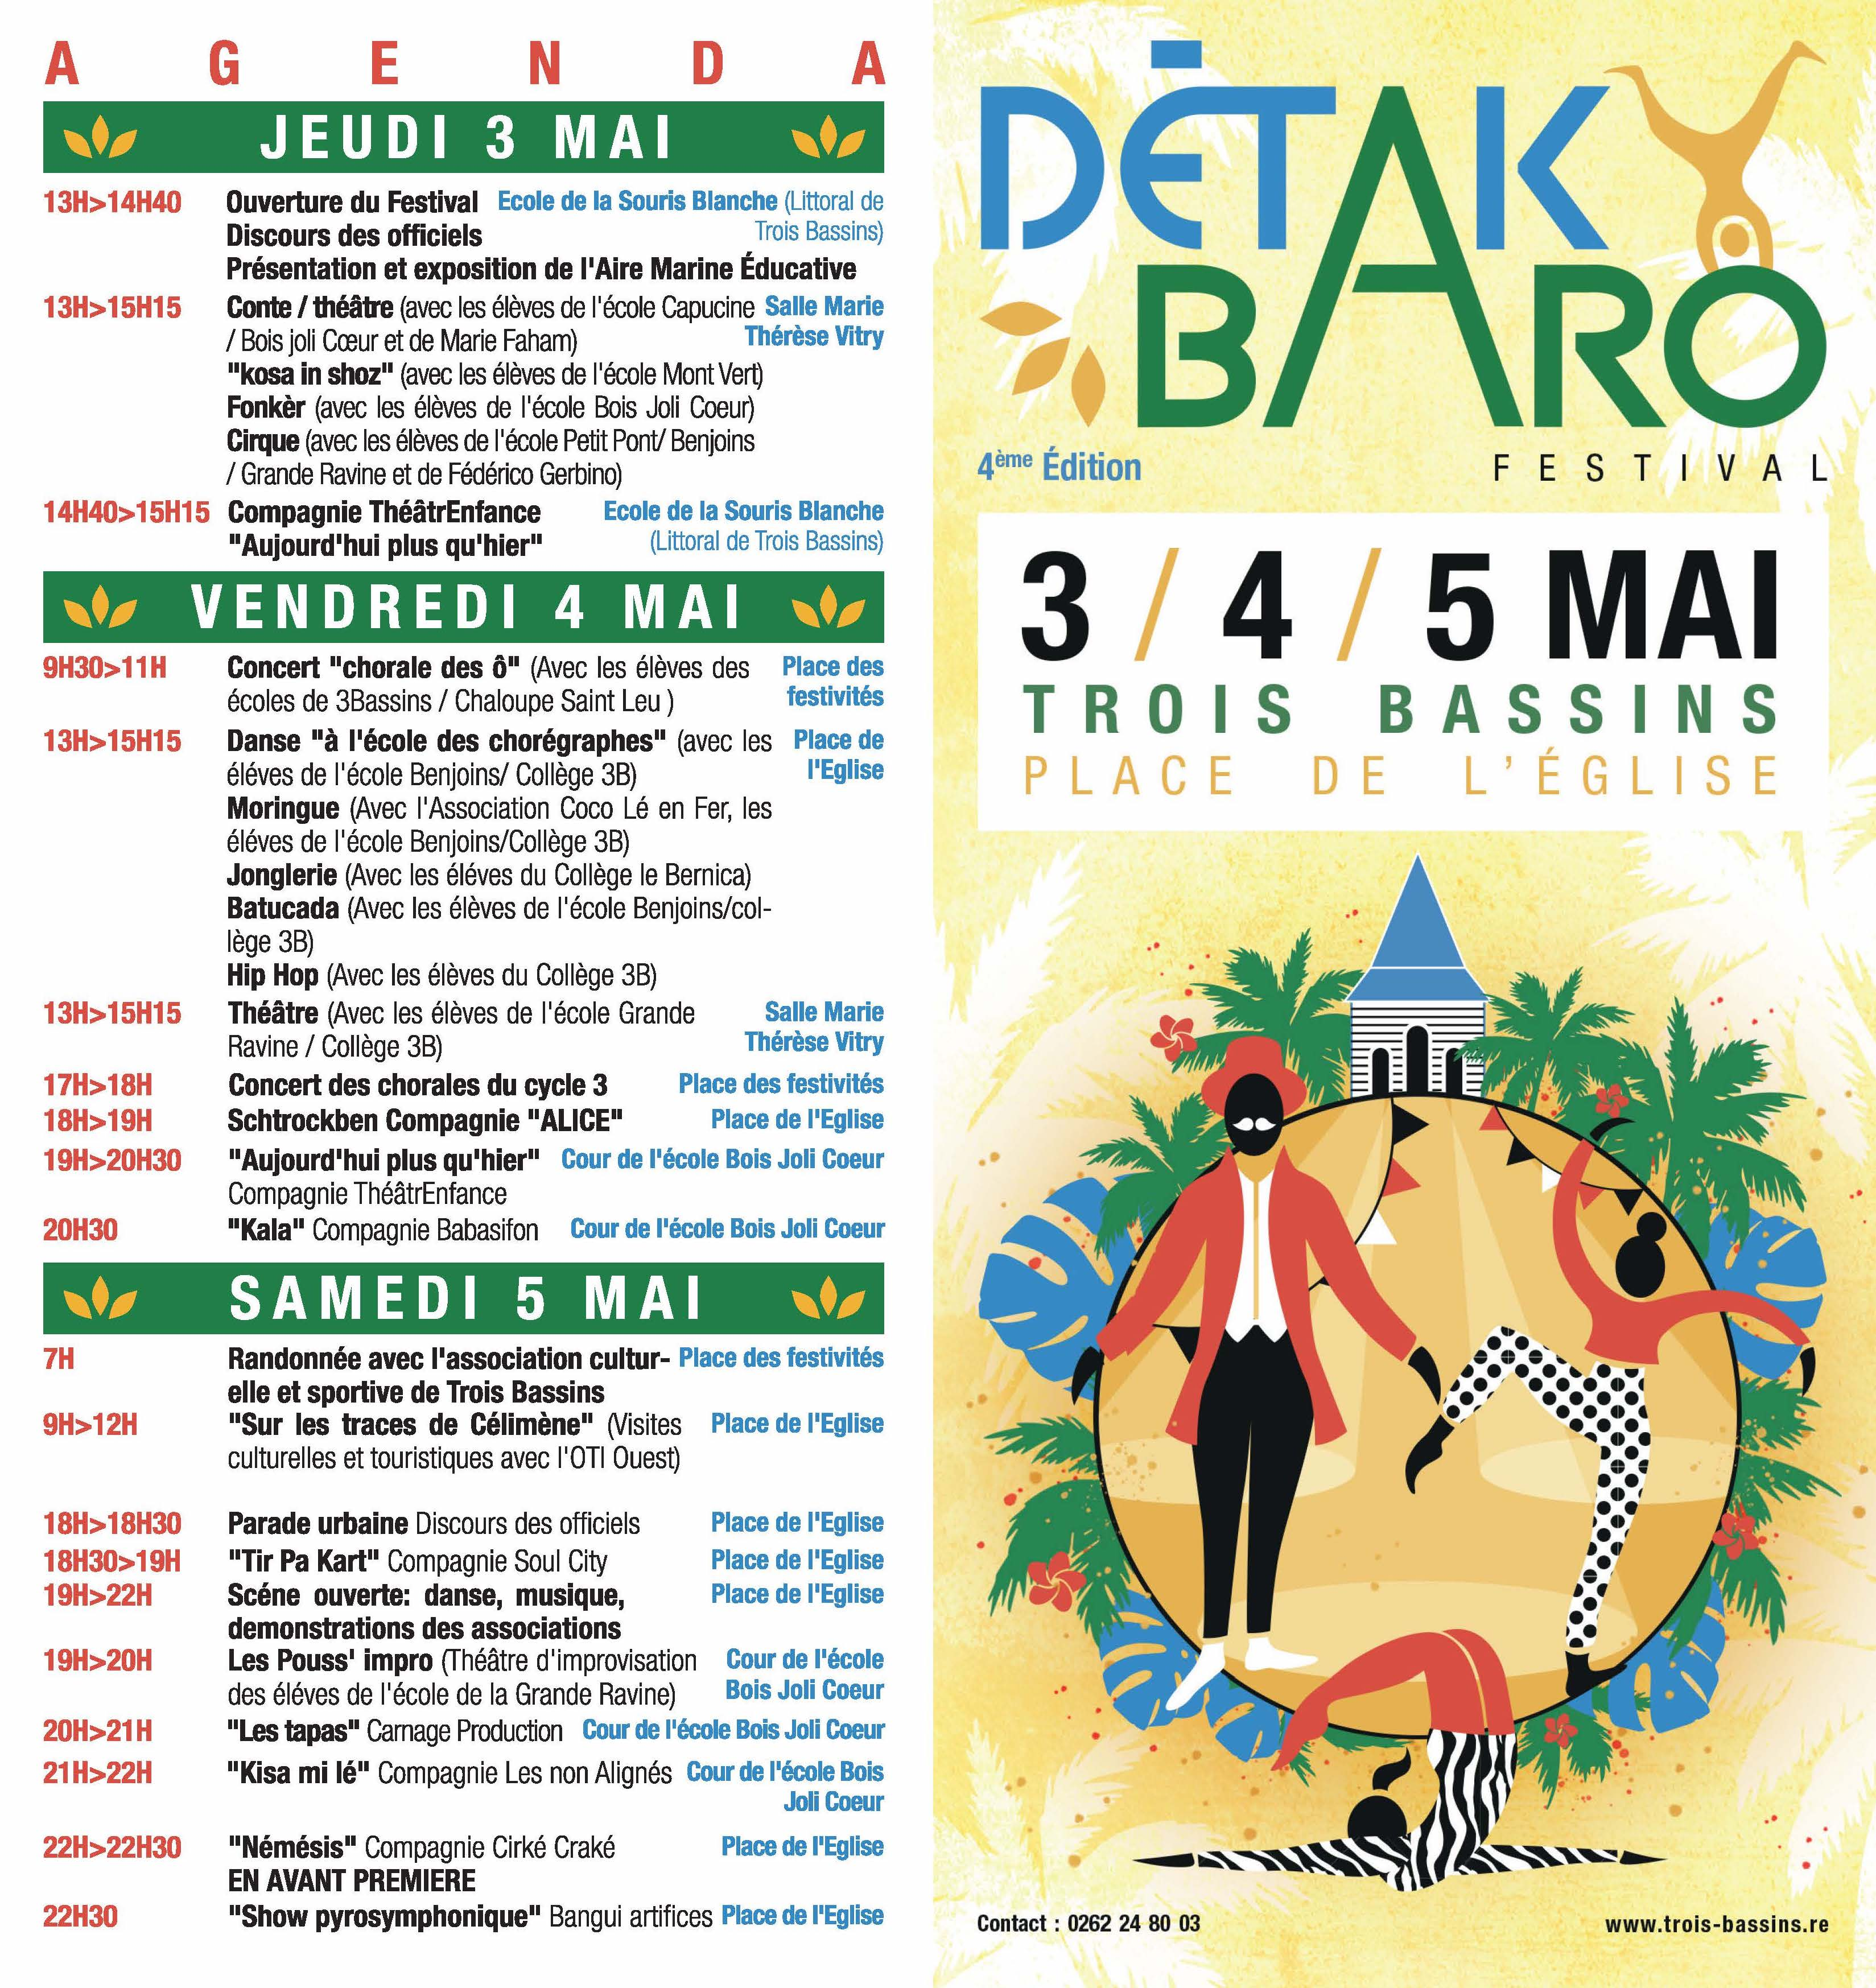 Programme-Détak-Baro-Festival-2018